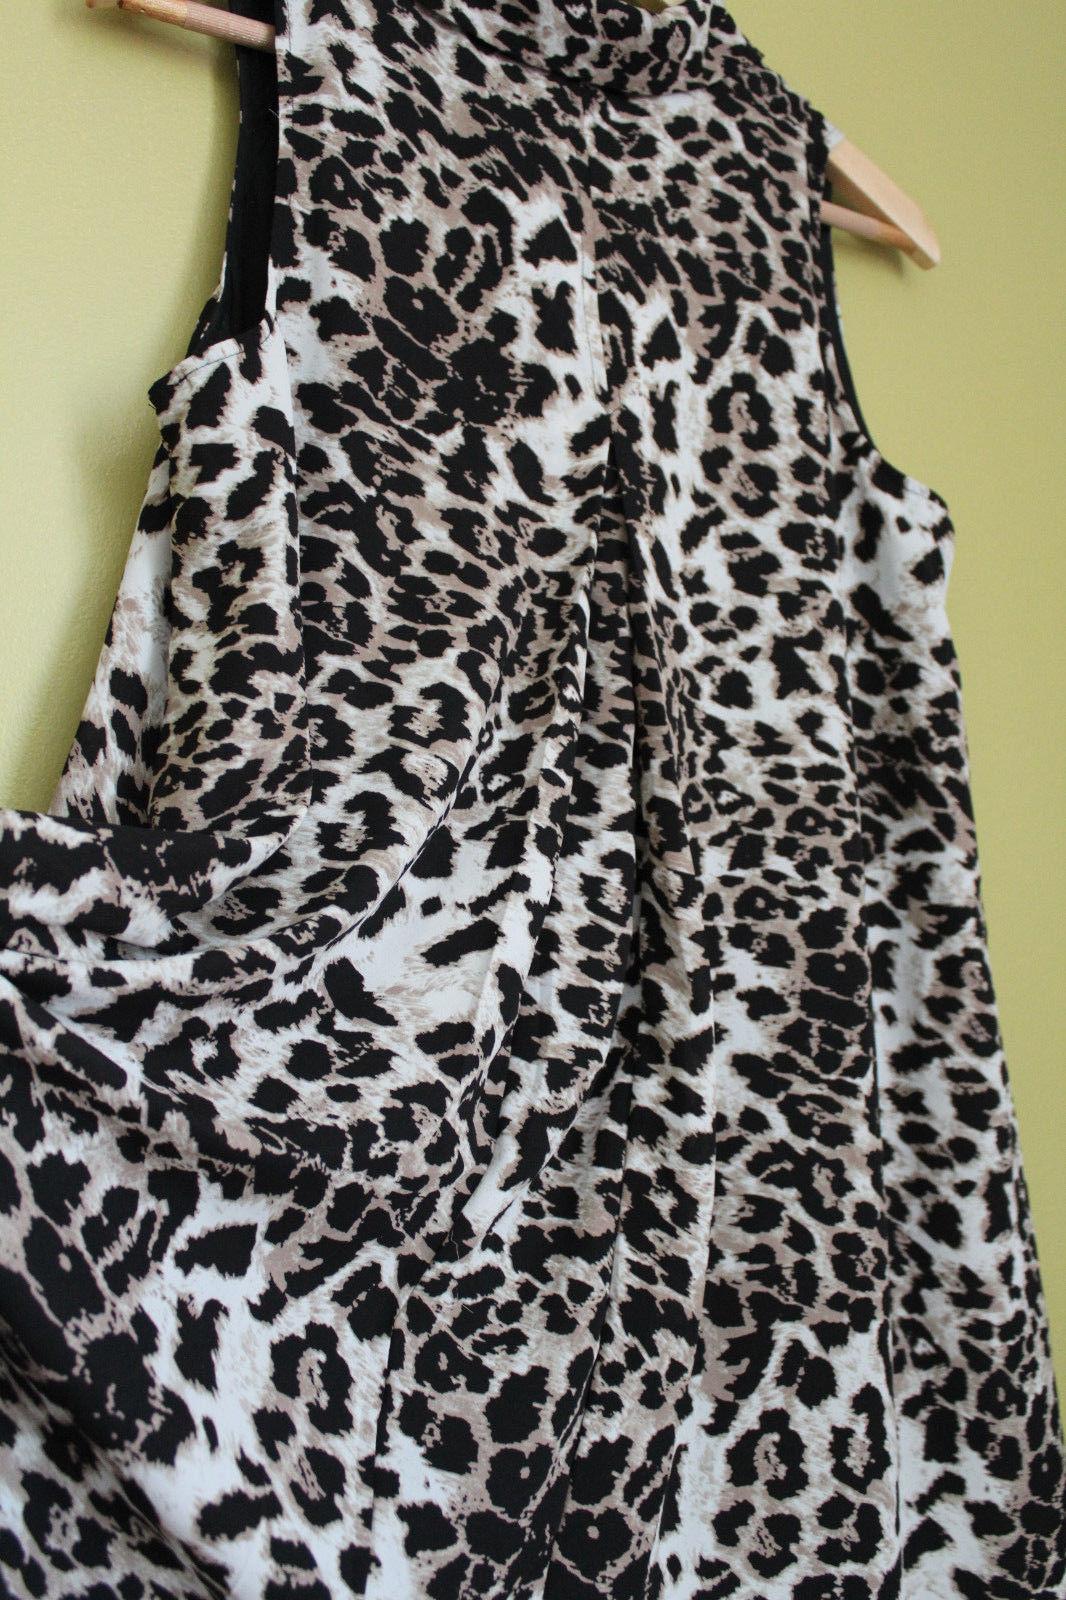 NWT Adrianna Papell Leopard Cheetah Print Long Tunic Top Swim Cover Up Dress 6